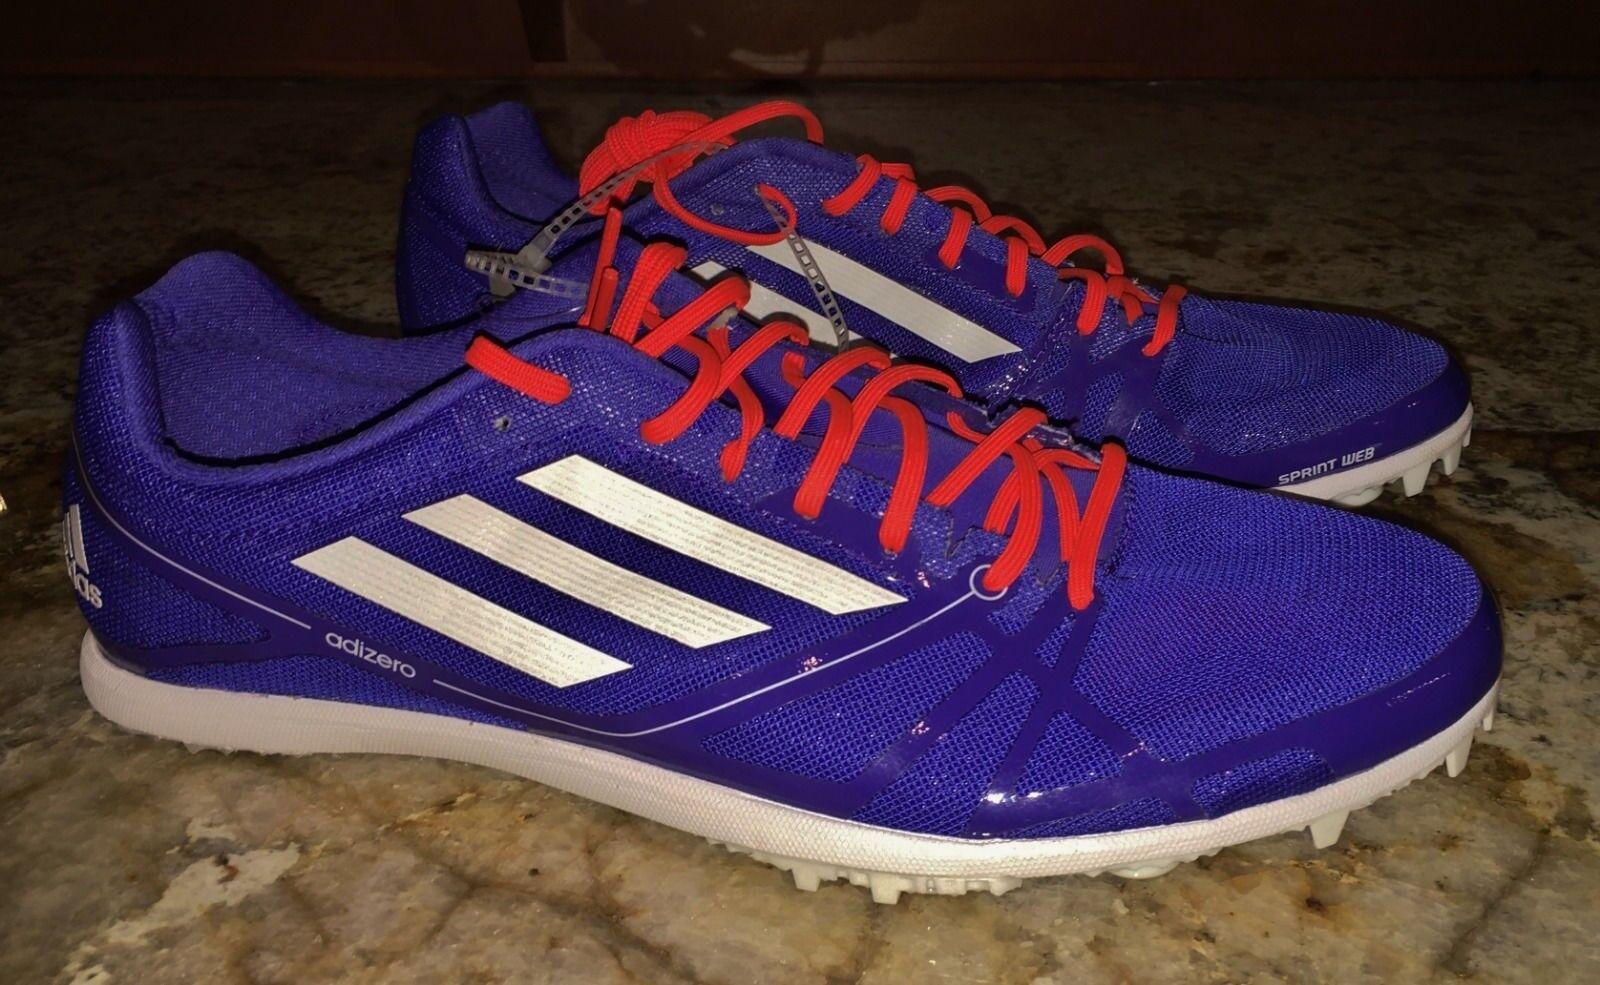 ADIDAS AdiZero Avanti 2 Distance Track Spike Shoes Night Blue New Men 10.5 12 13